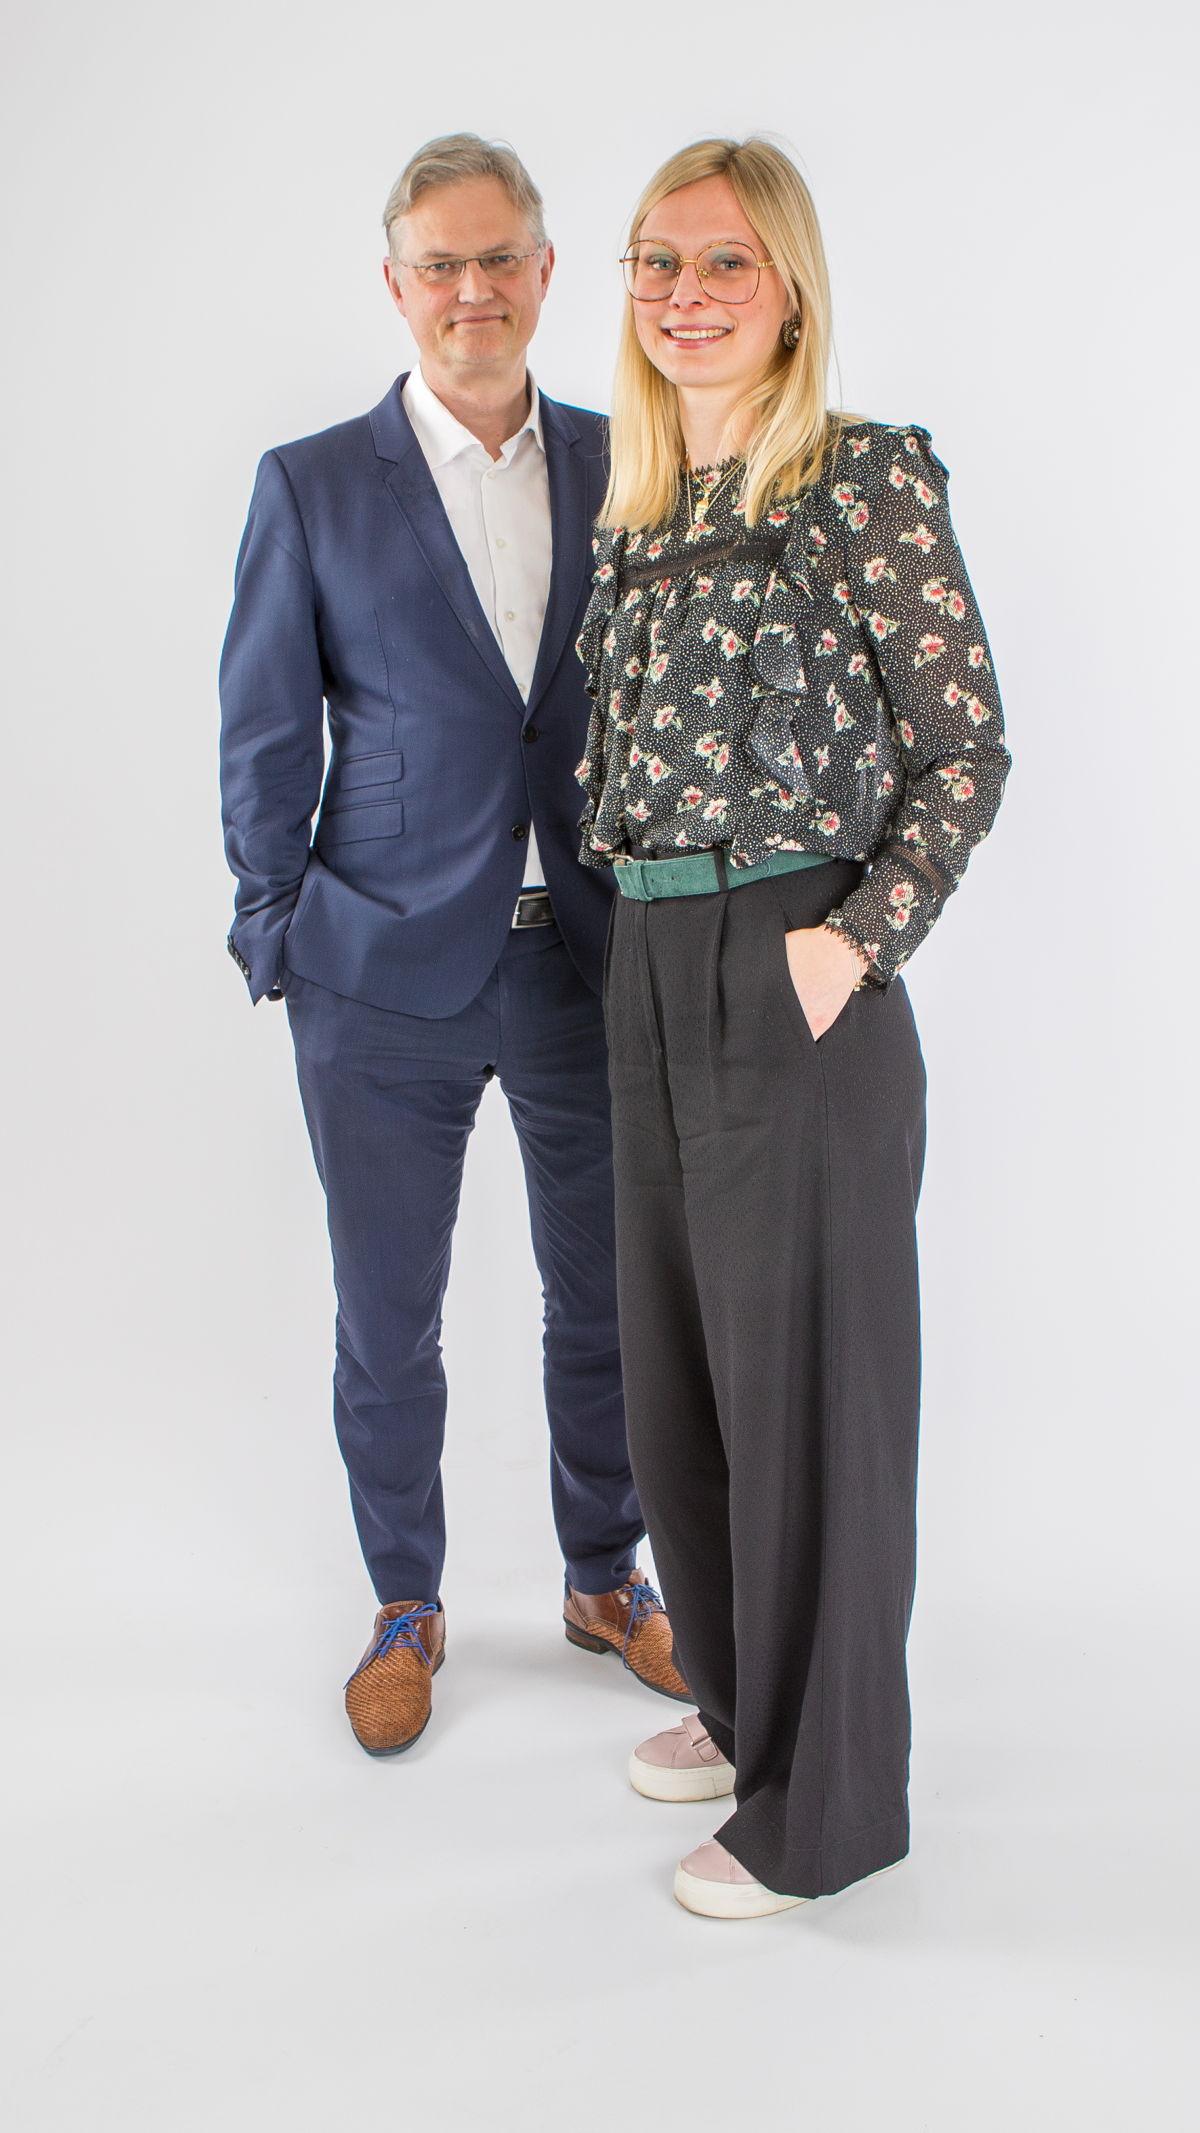 Ombudsman Tim Pauwels en Klachtencoördinator Anabel Coremans (c) VRT